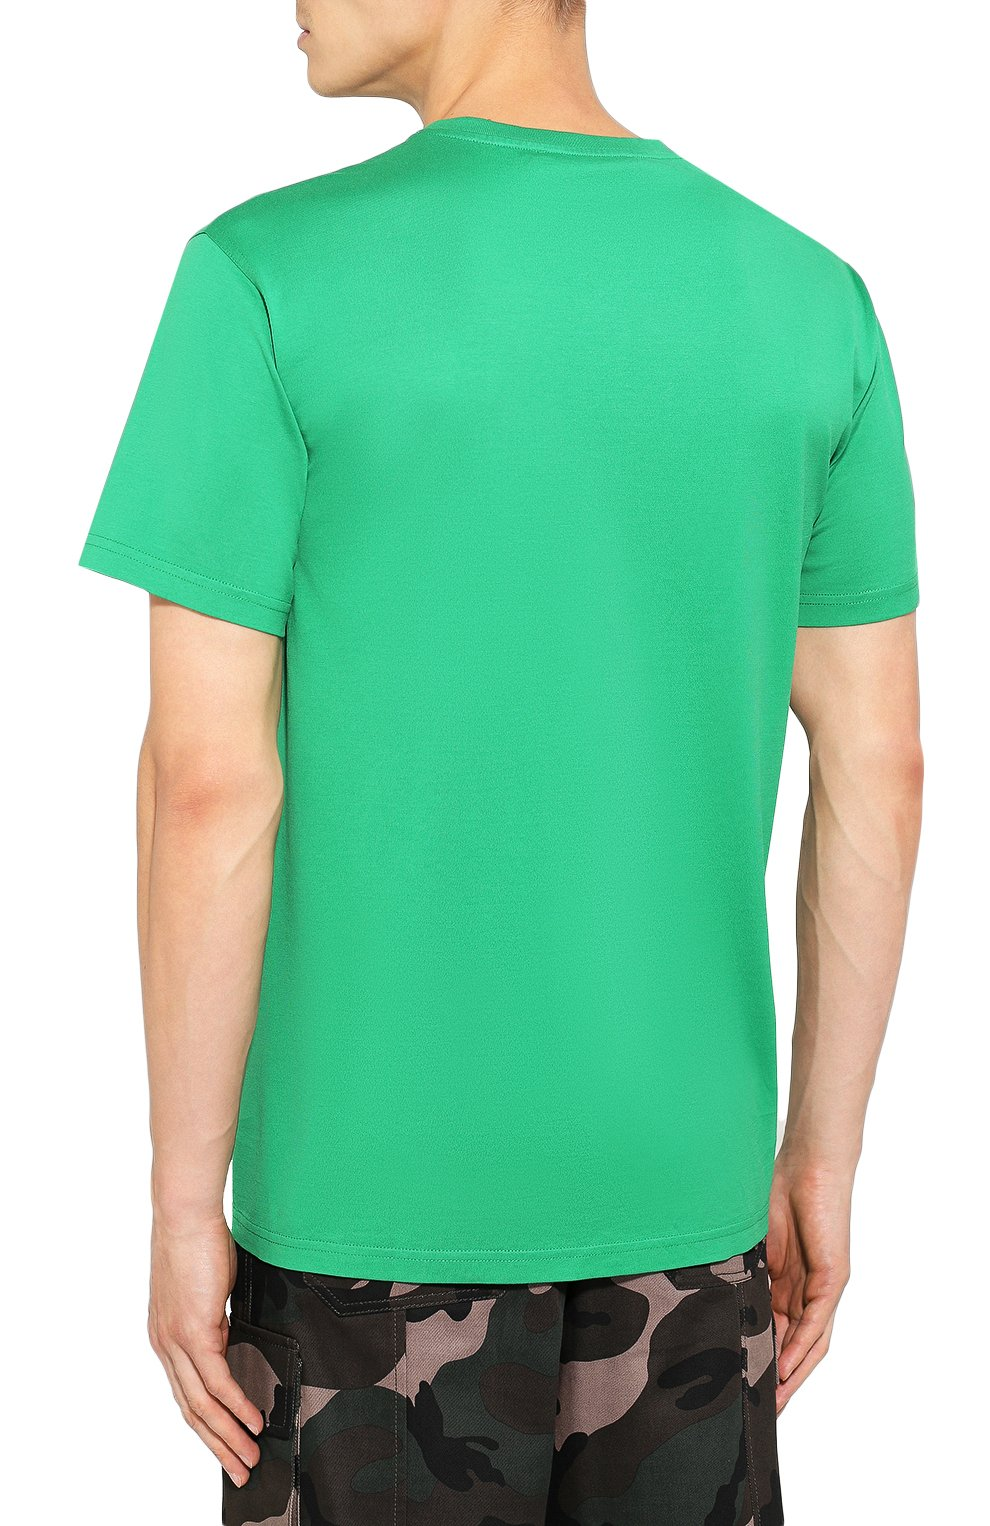 Хлопковая футболка Givenchy зеленая   Фото №4